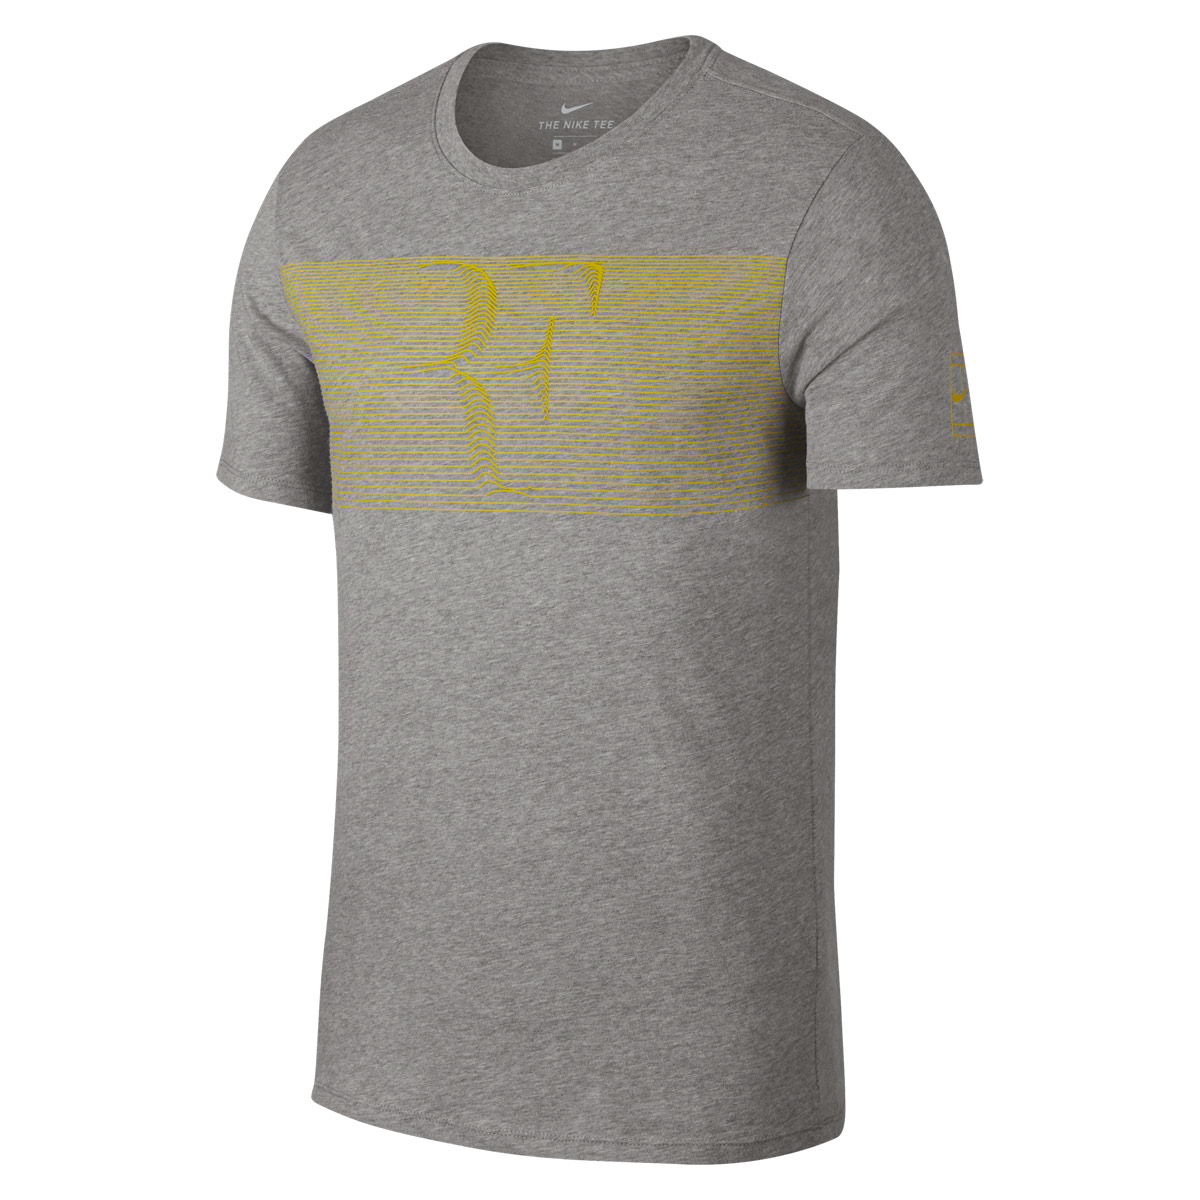 Roger Federer 2018 BNP Paribas Open Indian Wells RF Shirt - Roger Federer  2018 Indian Wells 2732bc217cc95